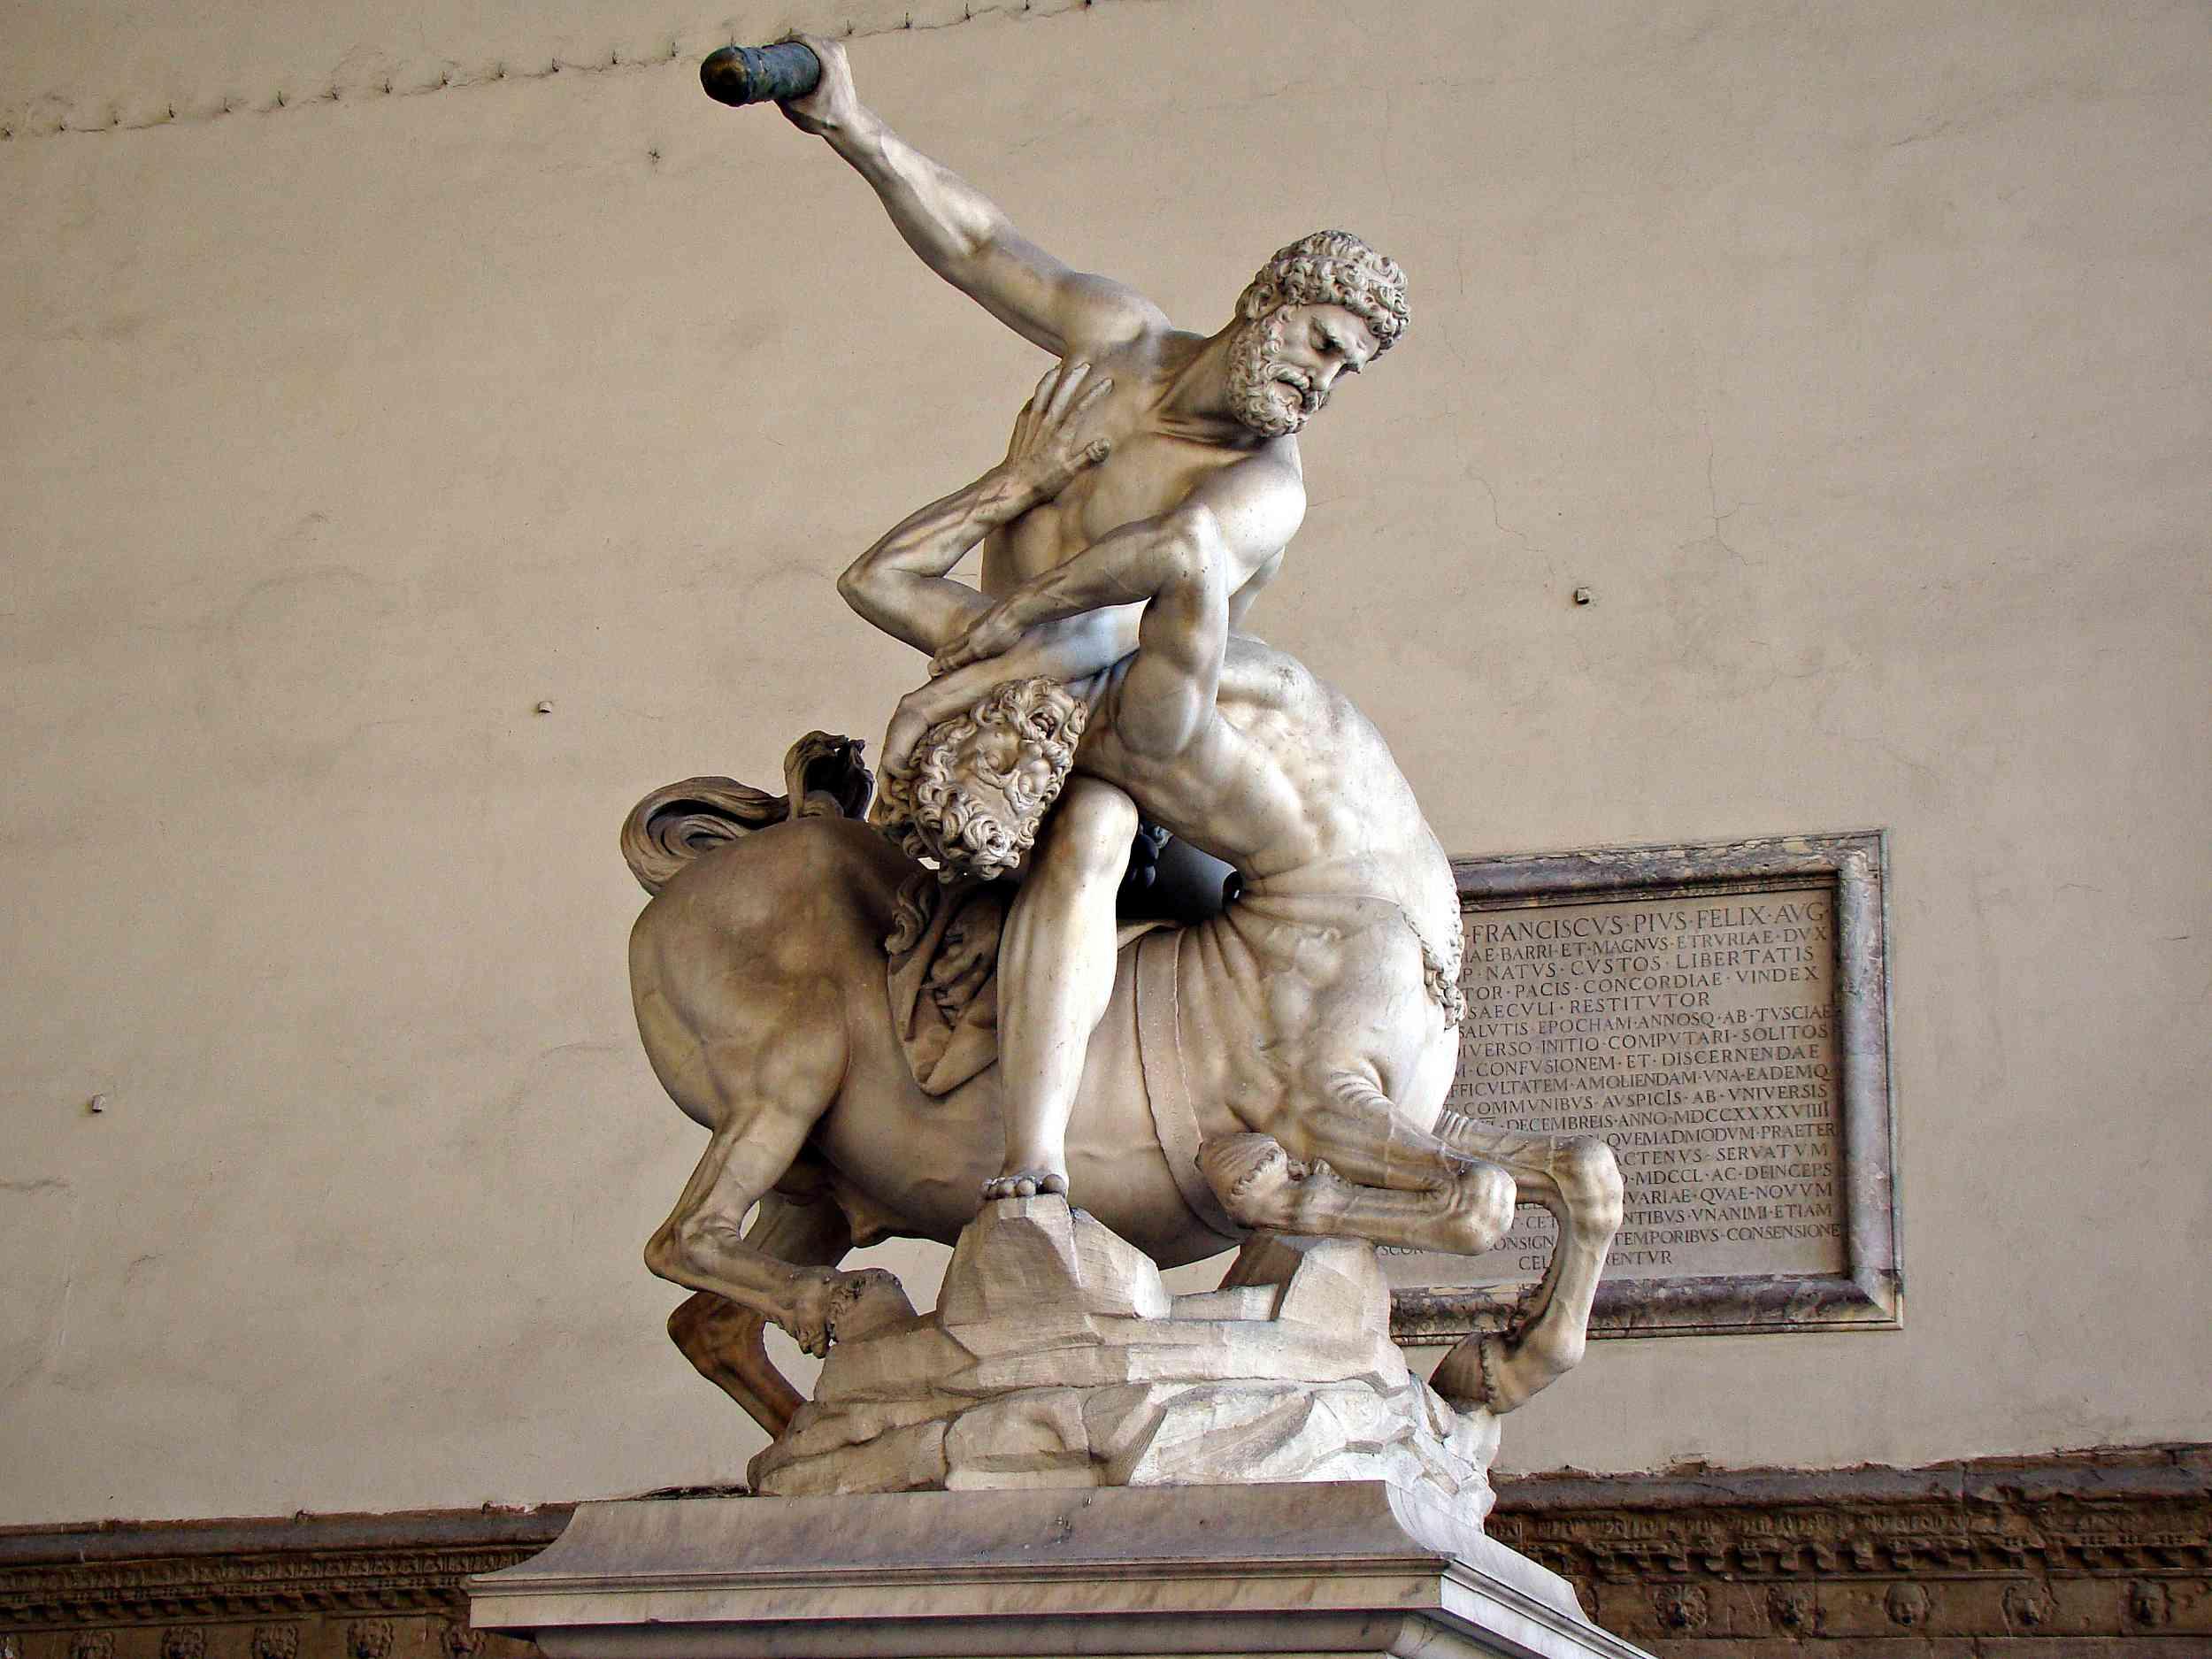 Giambologna's Hercules and the Centaur Nessus